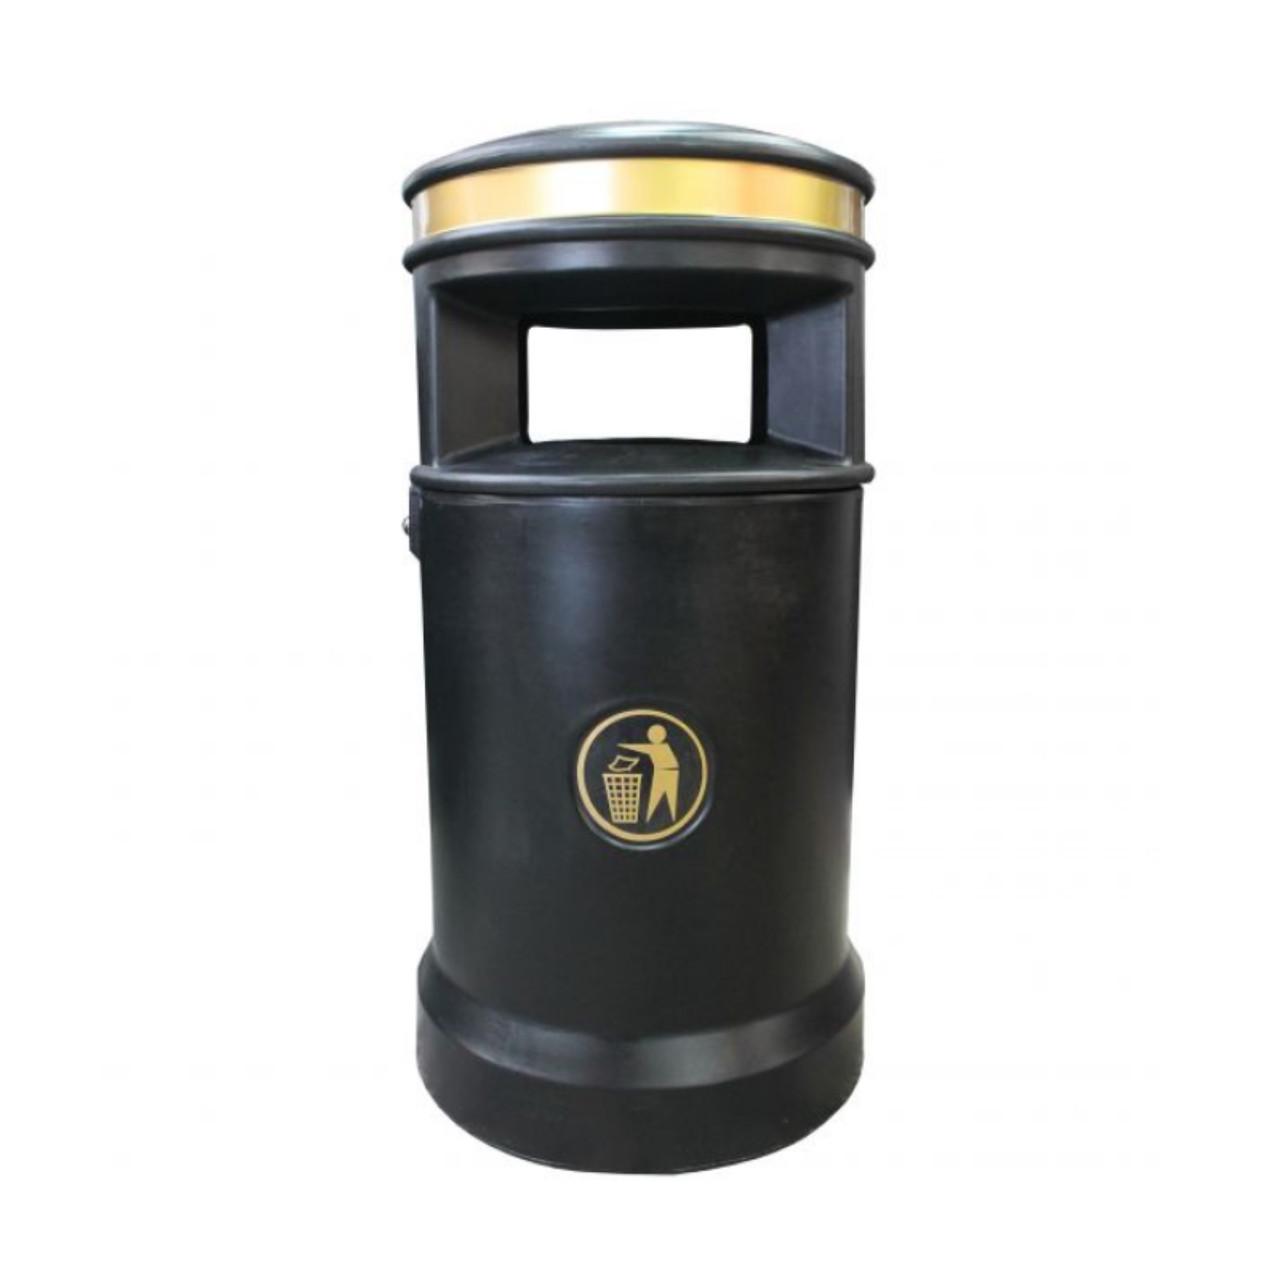 Black Ravenbank 120 Litre school litter bin